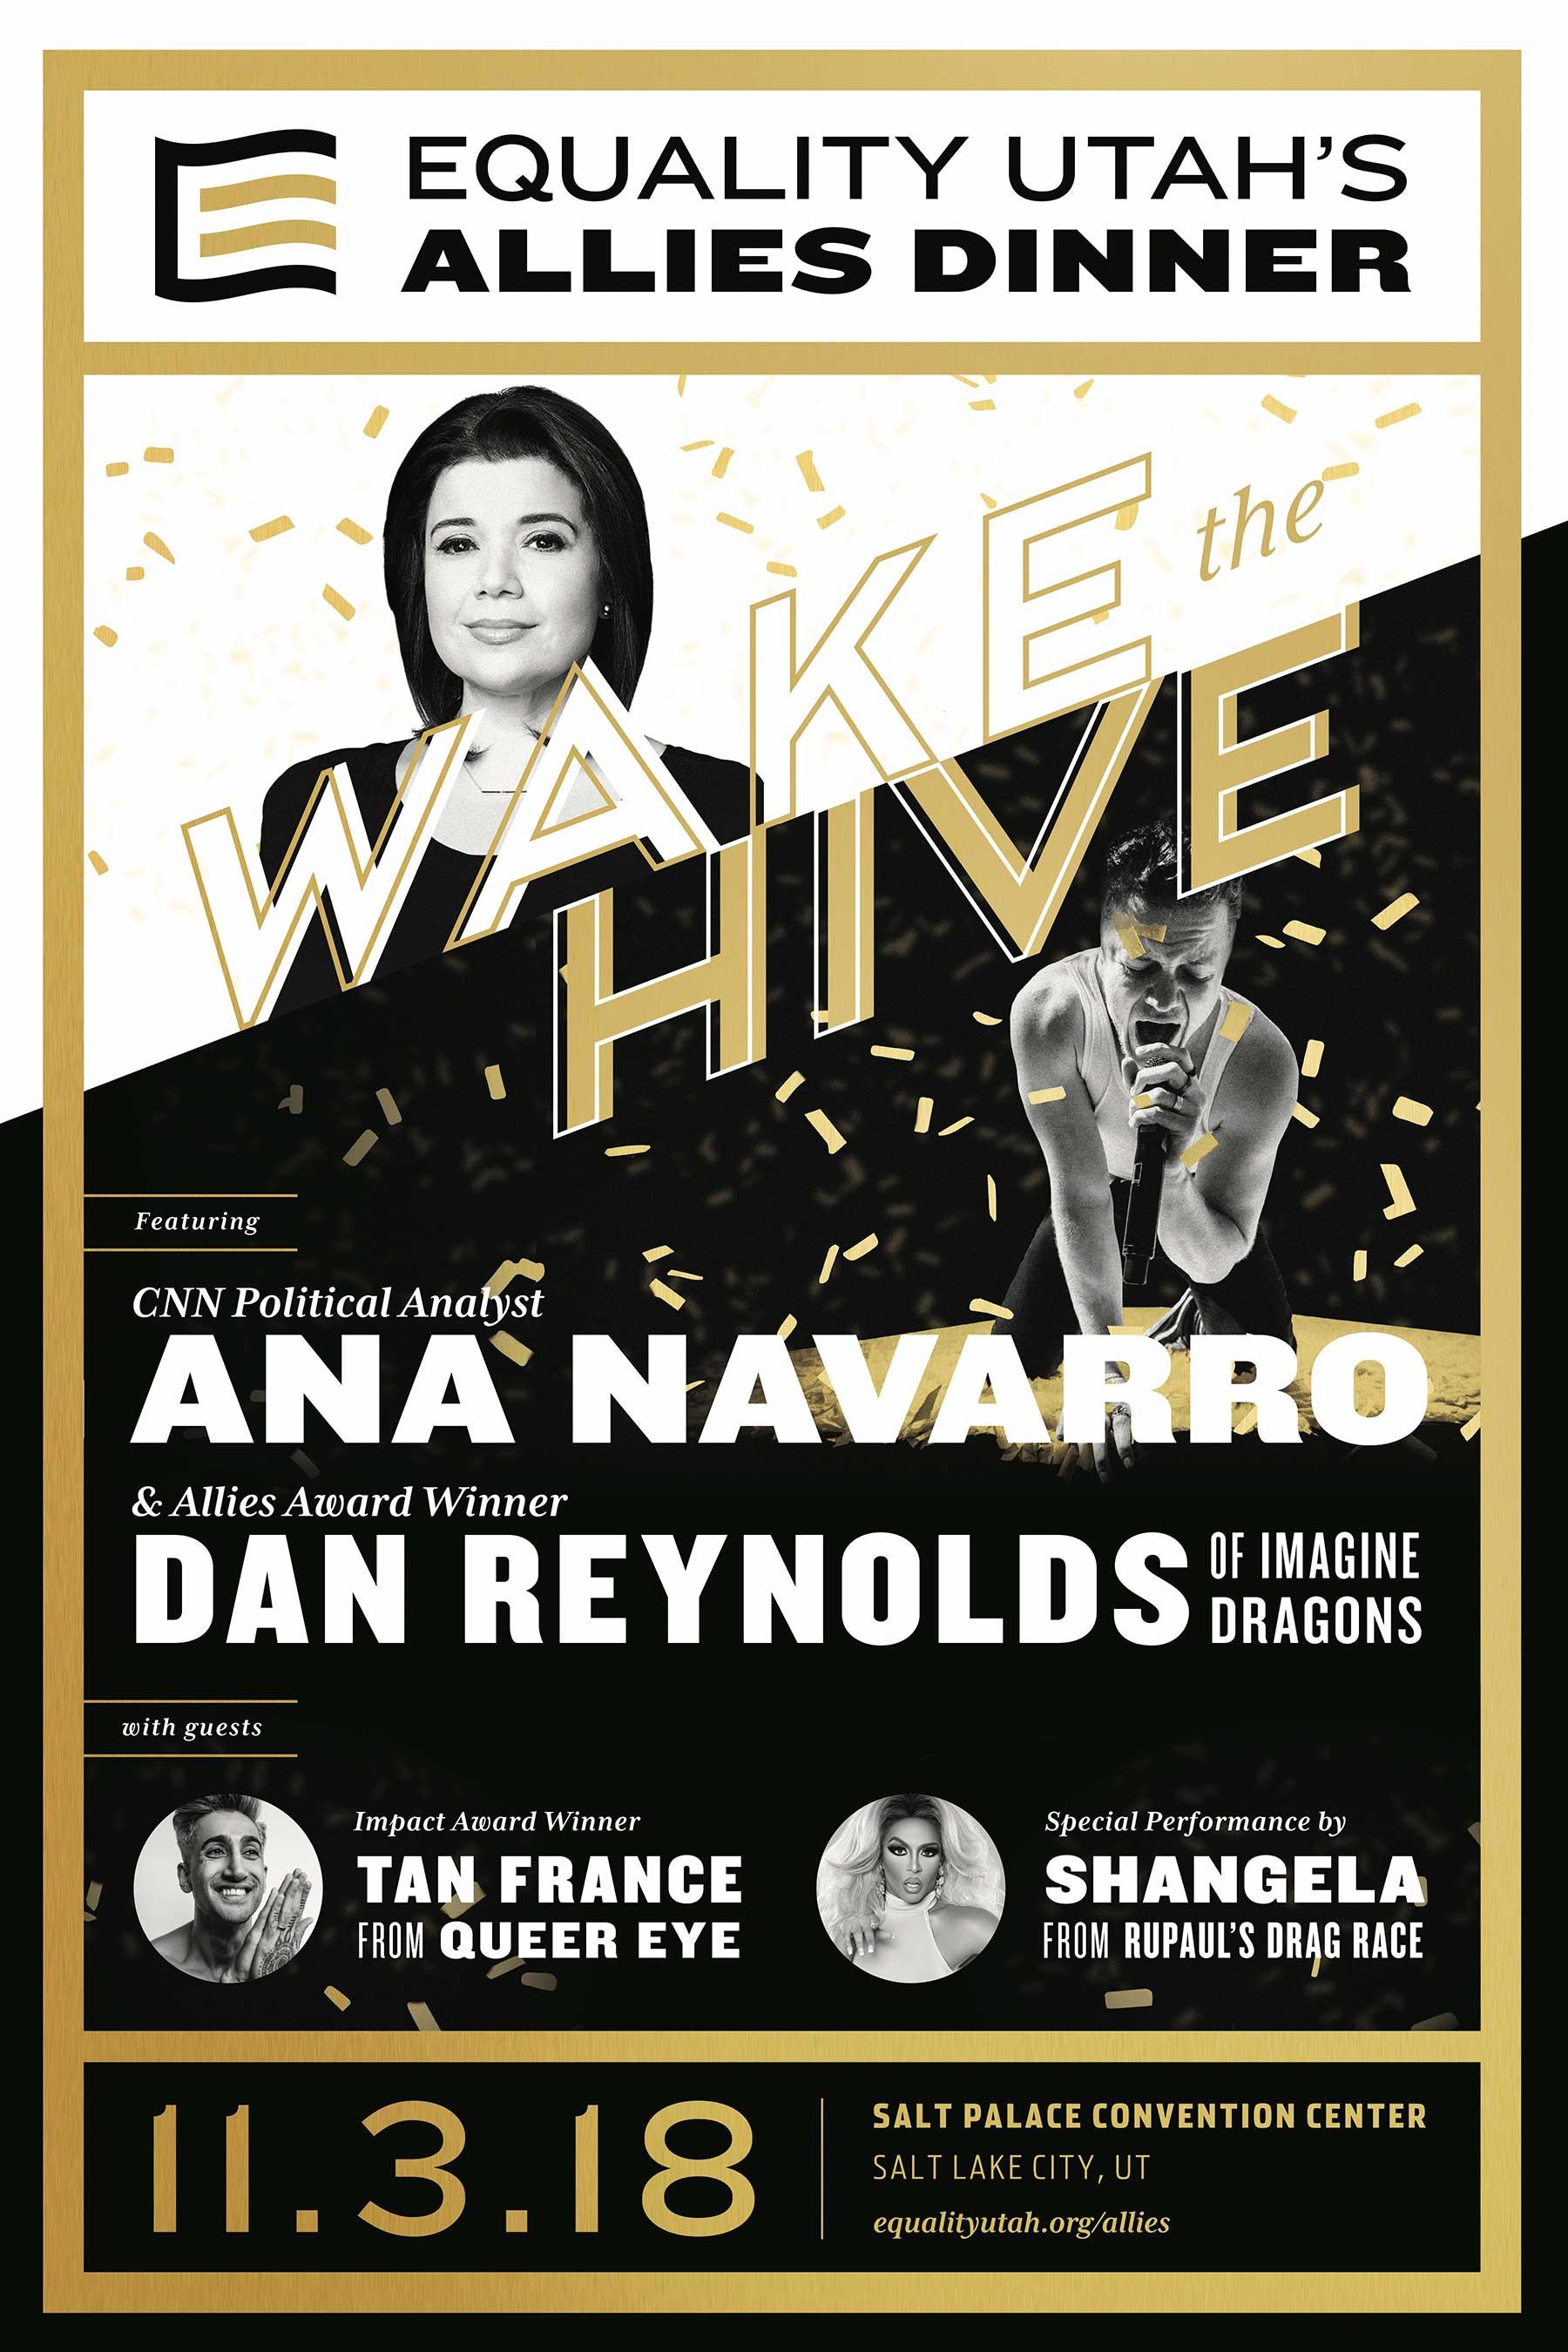 2018 Allies Dinner featuring Dan Reynolds, Ana Navarro, Tan France, and Shangela poster